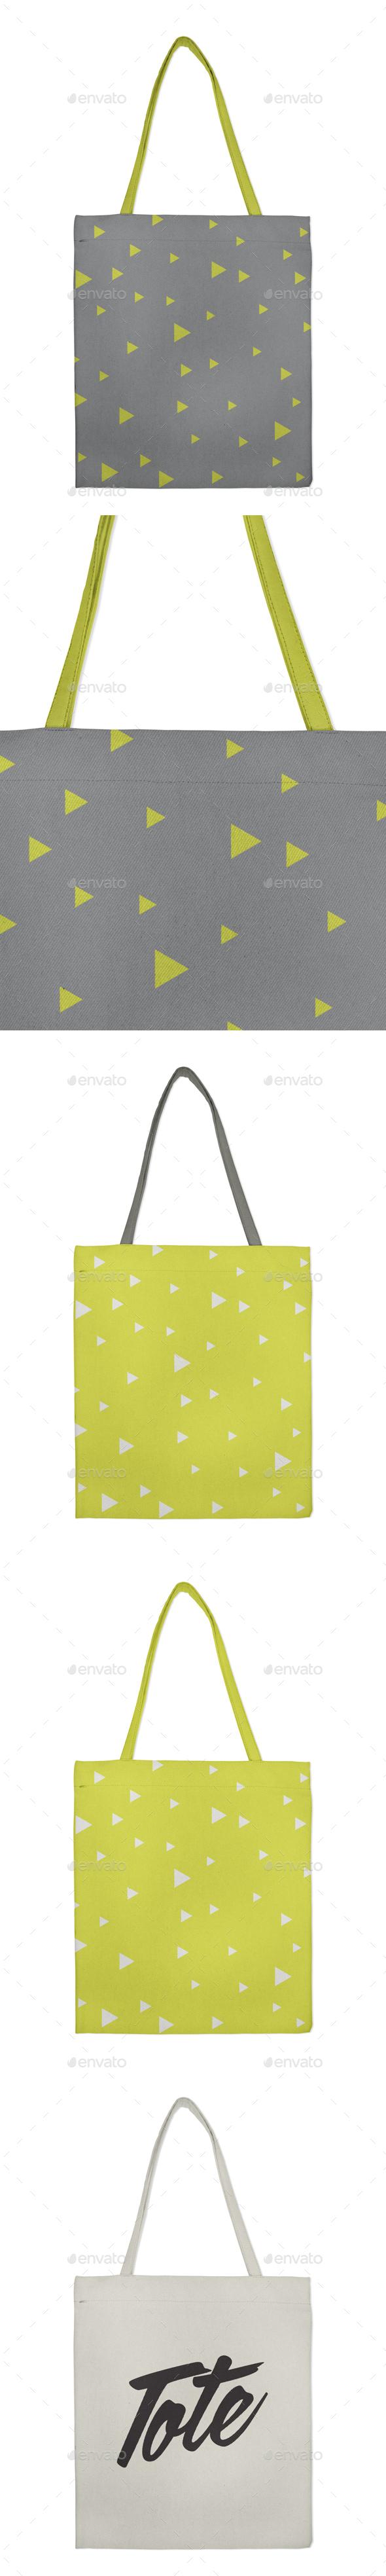 Canvas Tote Bag Mockup - Miscellaneous Print